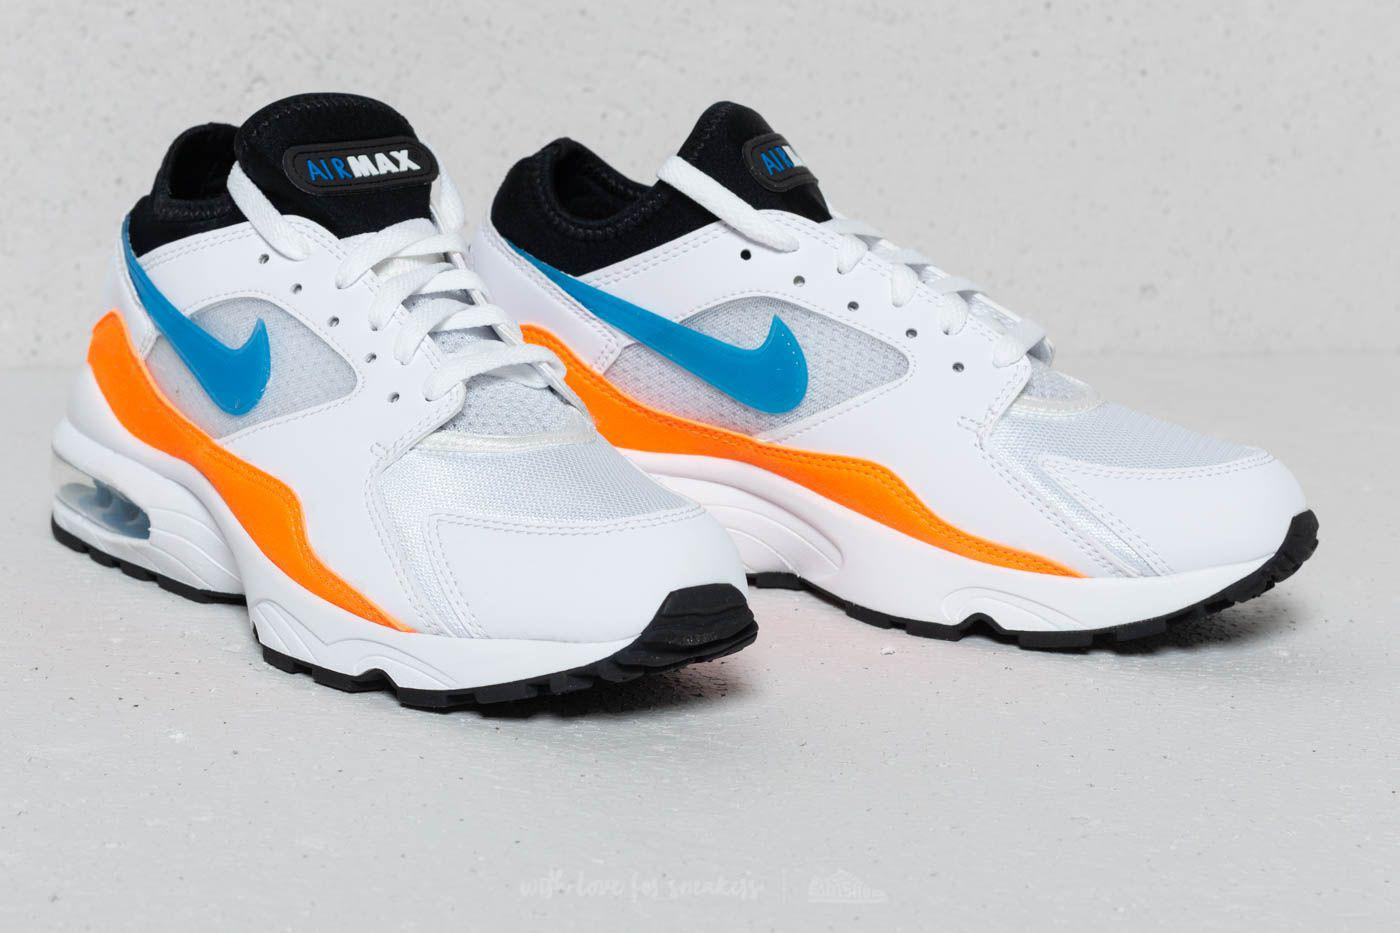 098fa081fc Lyst - Nike Air Max 93 White/ Blue Nebula-total Orange in Blue for Men